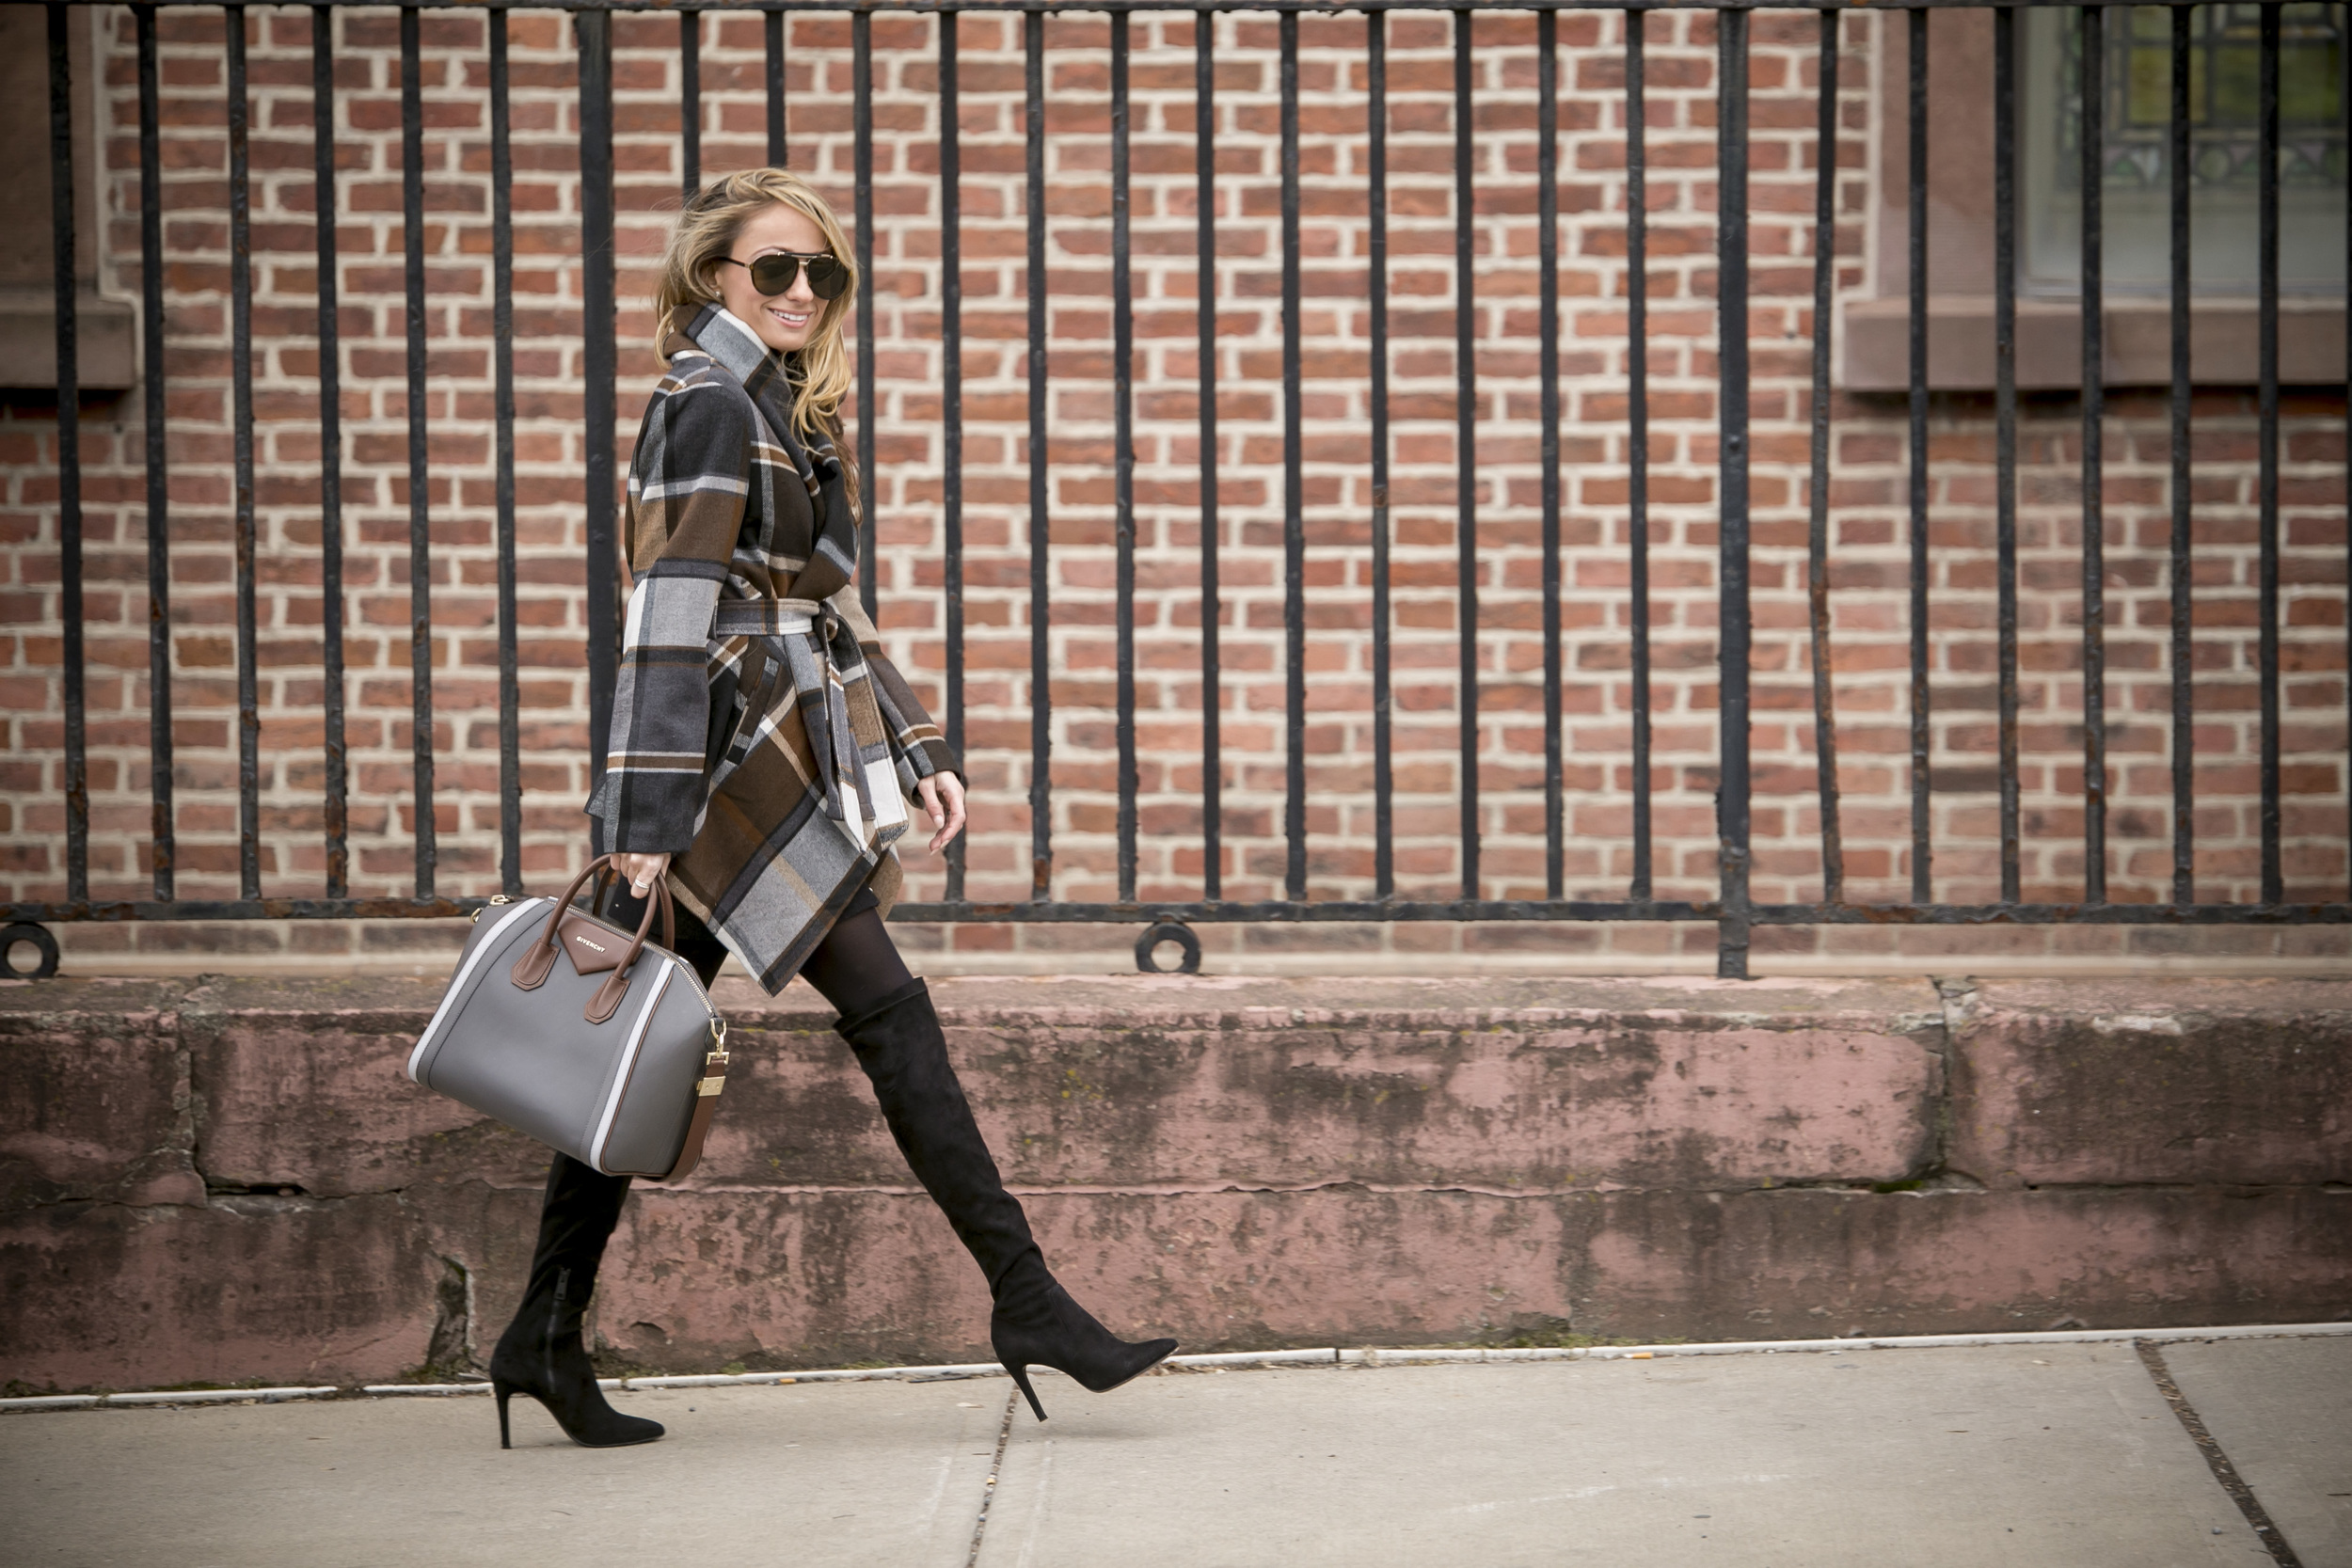 streetstyle after New York fashion week. Givenchy antigona bag and plaid coat